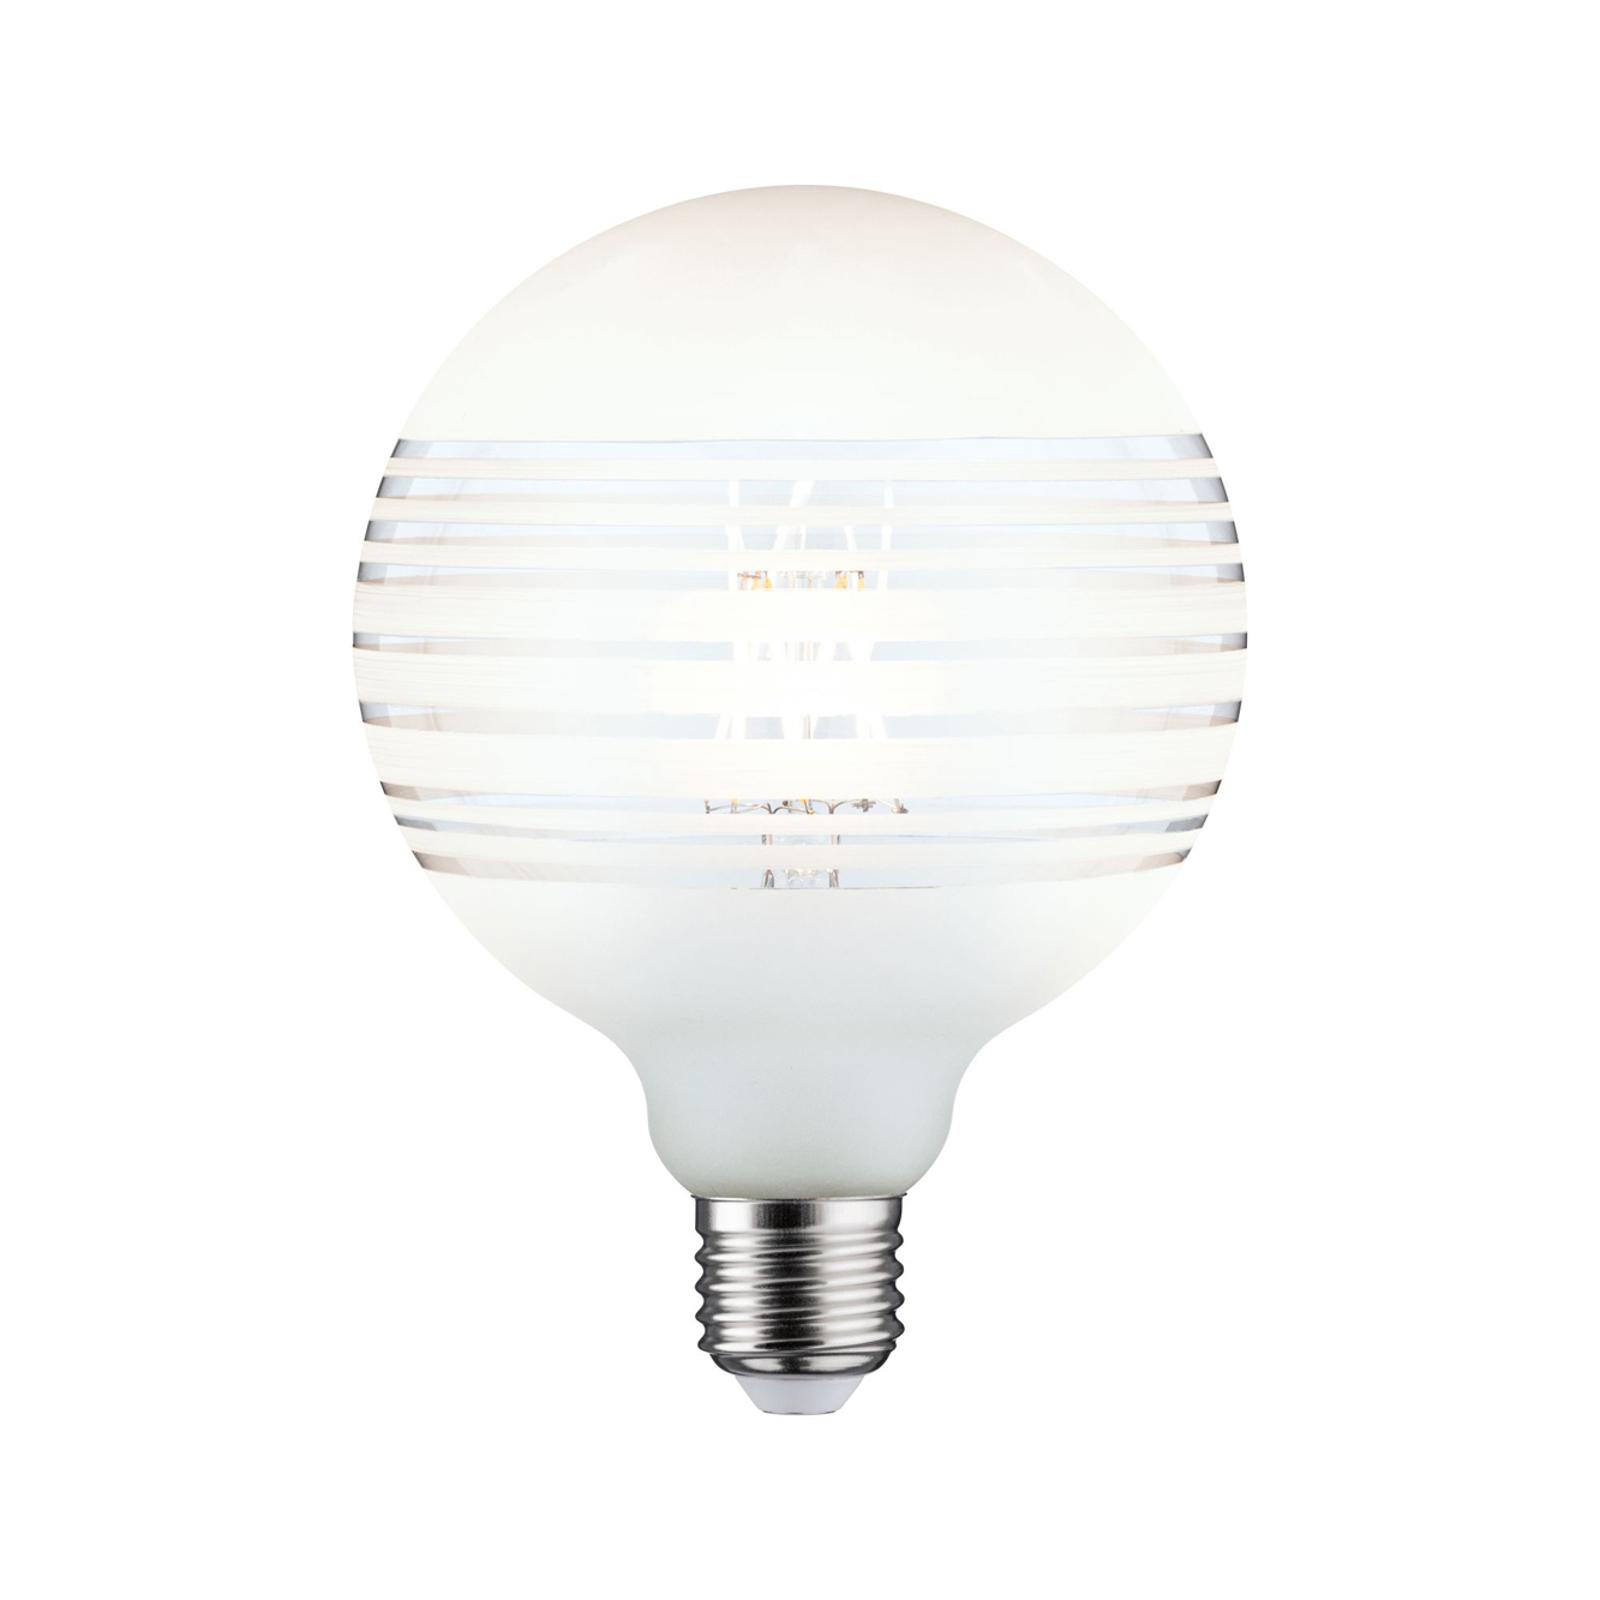 Paulmann E27 globe LED 4,5W anneau miroir lignes